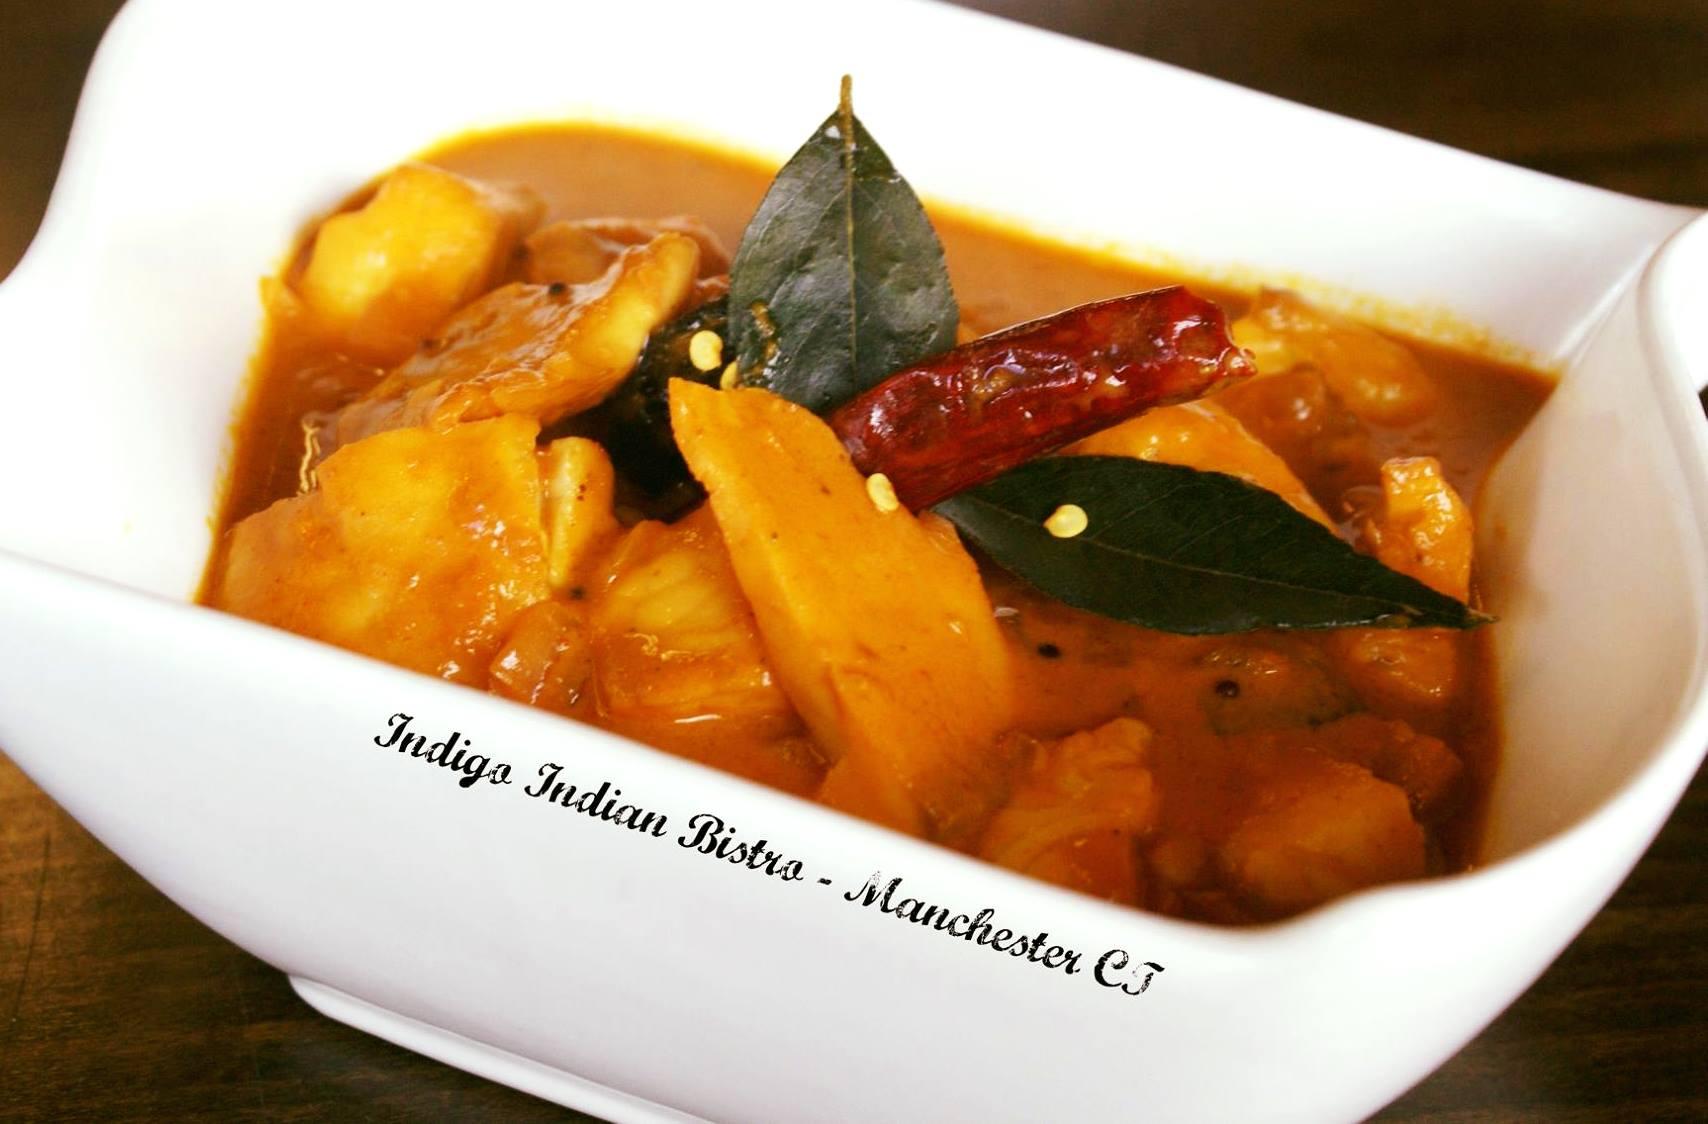 Kerala Fish Curry (#GF, #DF)